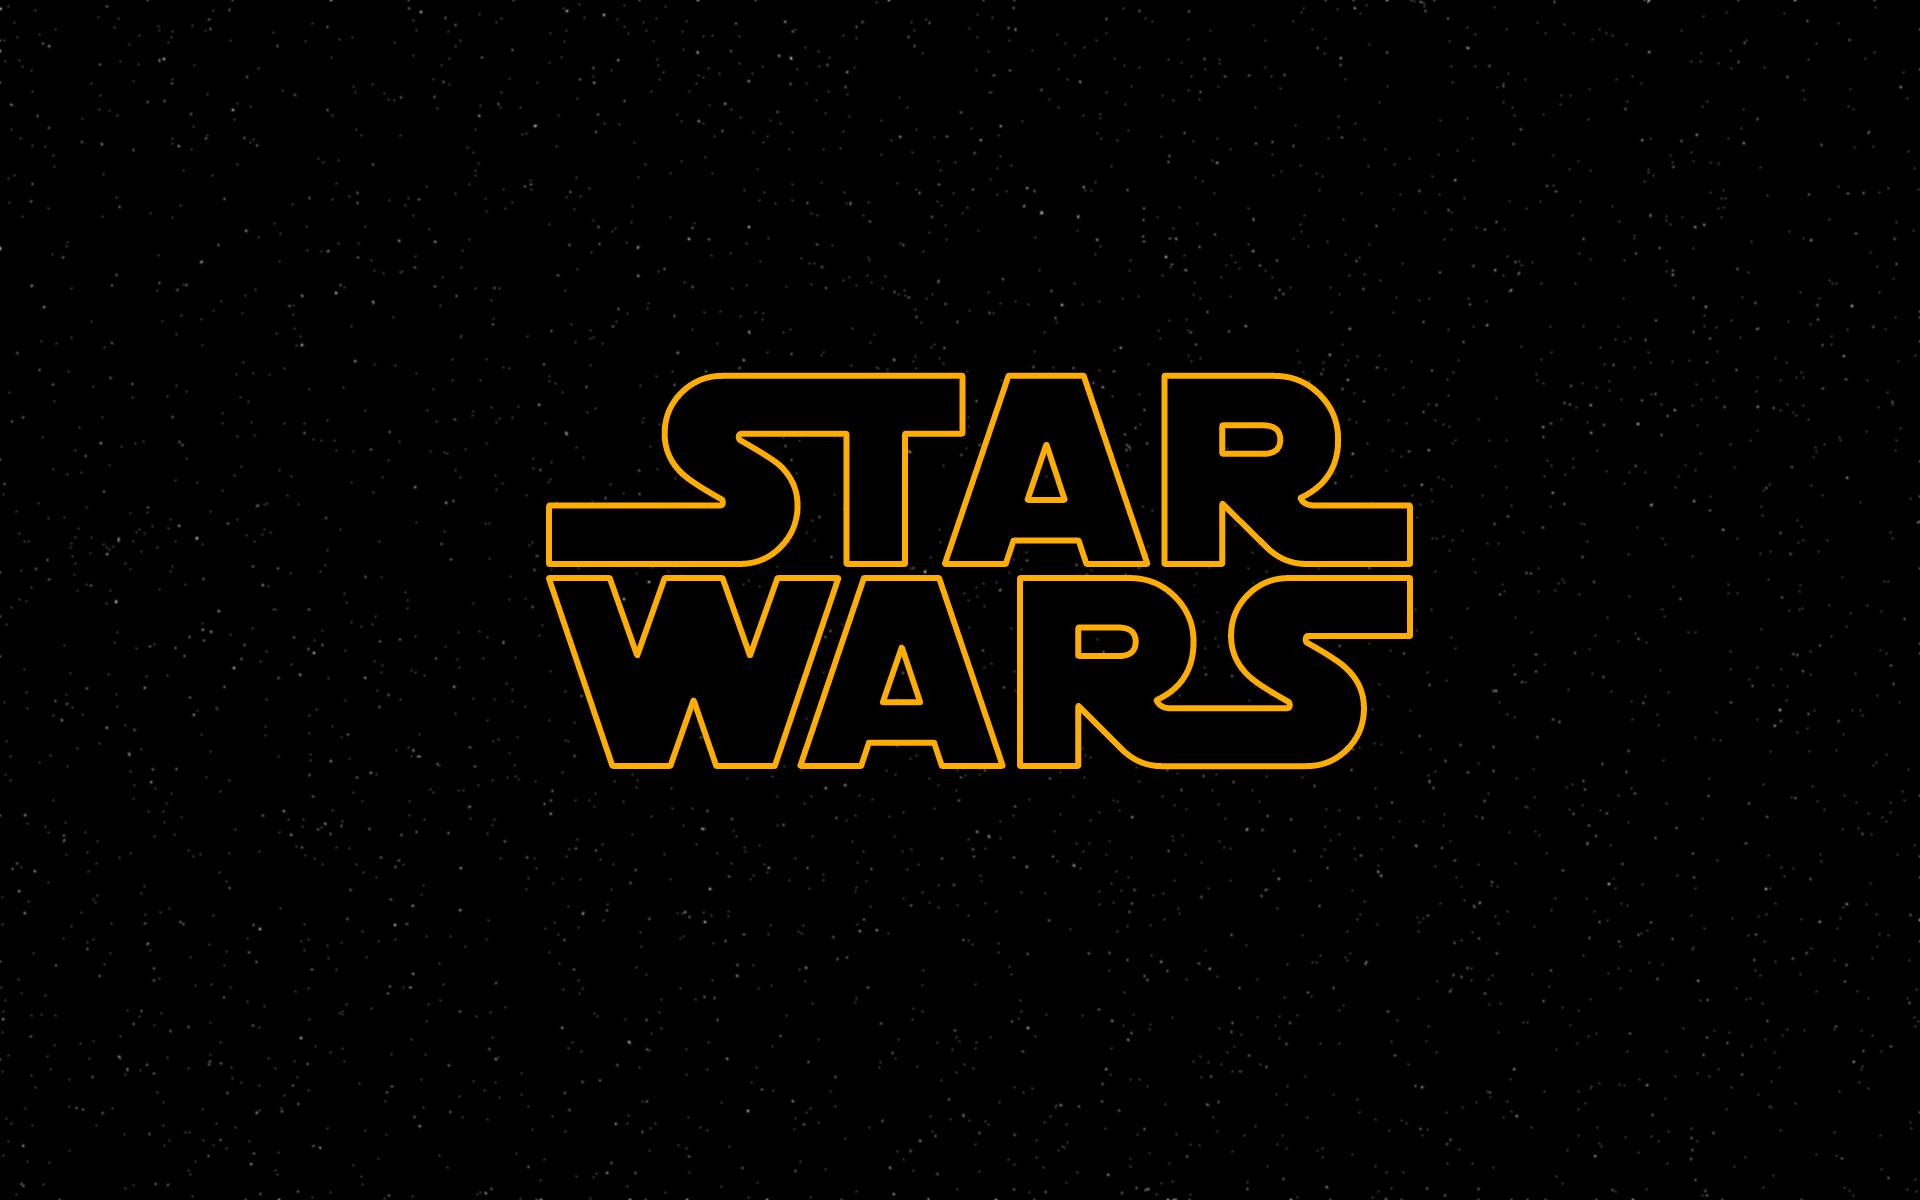 star-wars-wallpaper-33.gif